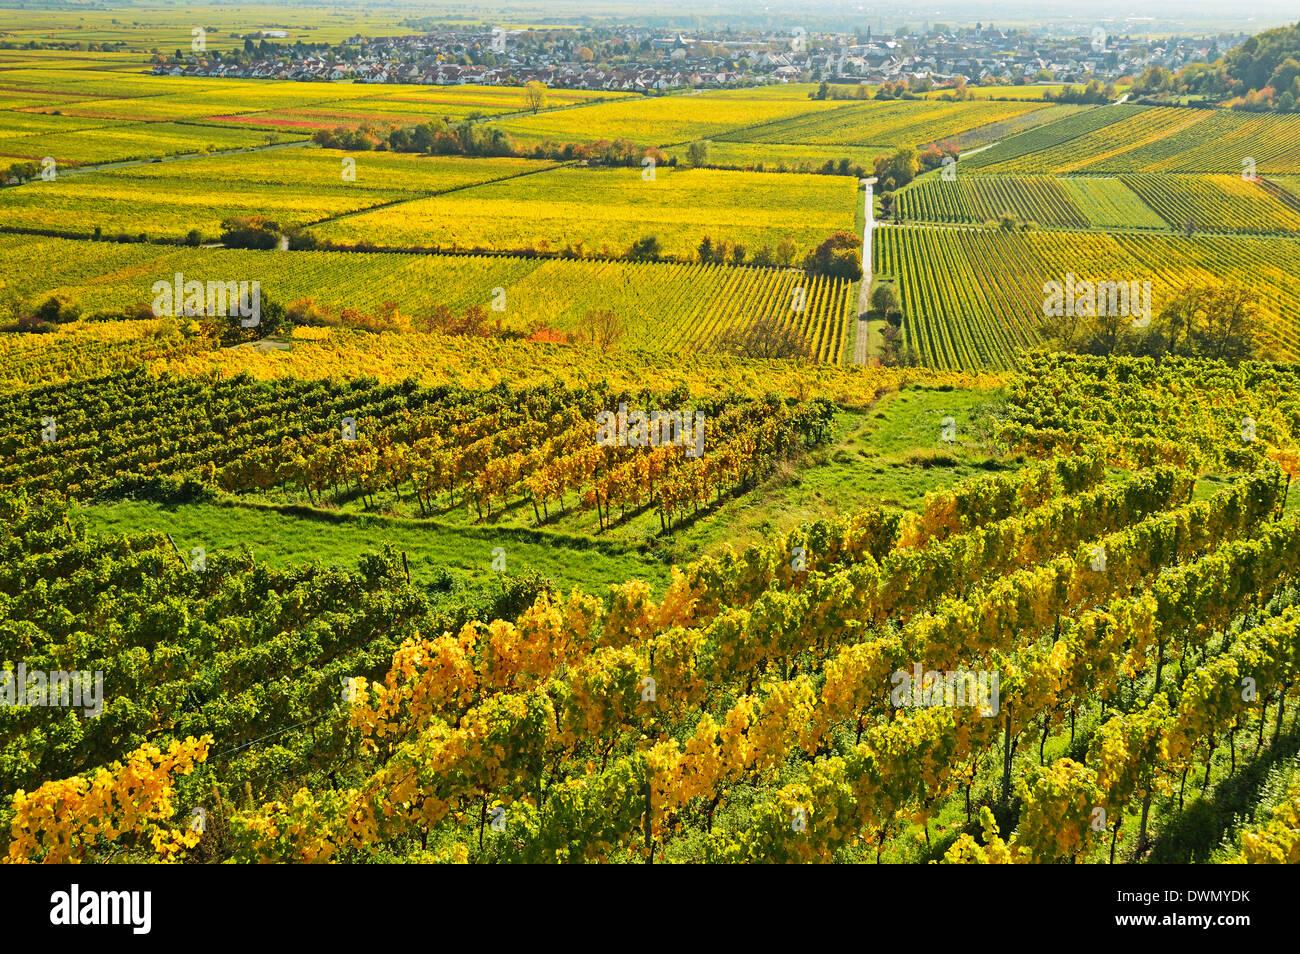 Vineyard landscape, near Bad Duerkheim, German Wine Route, Rhineland-Palatinate, Germany, Europe Stock Photo